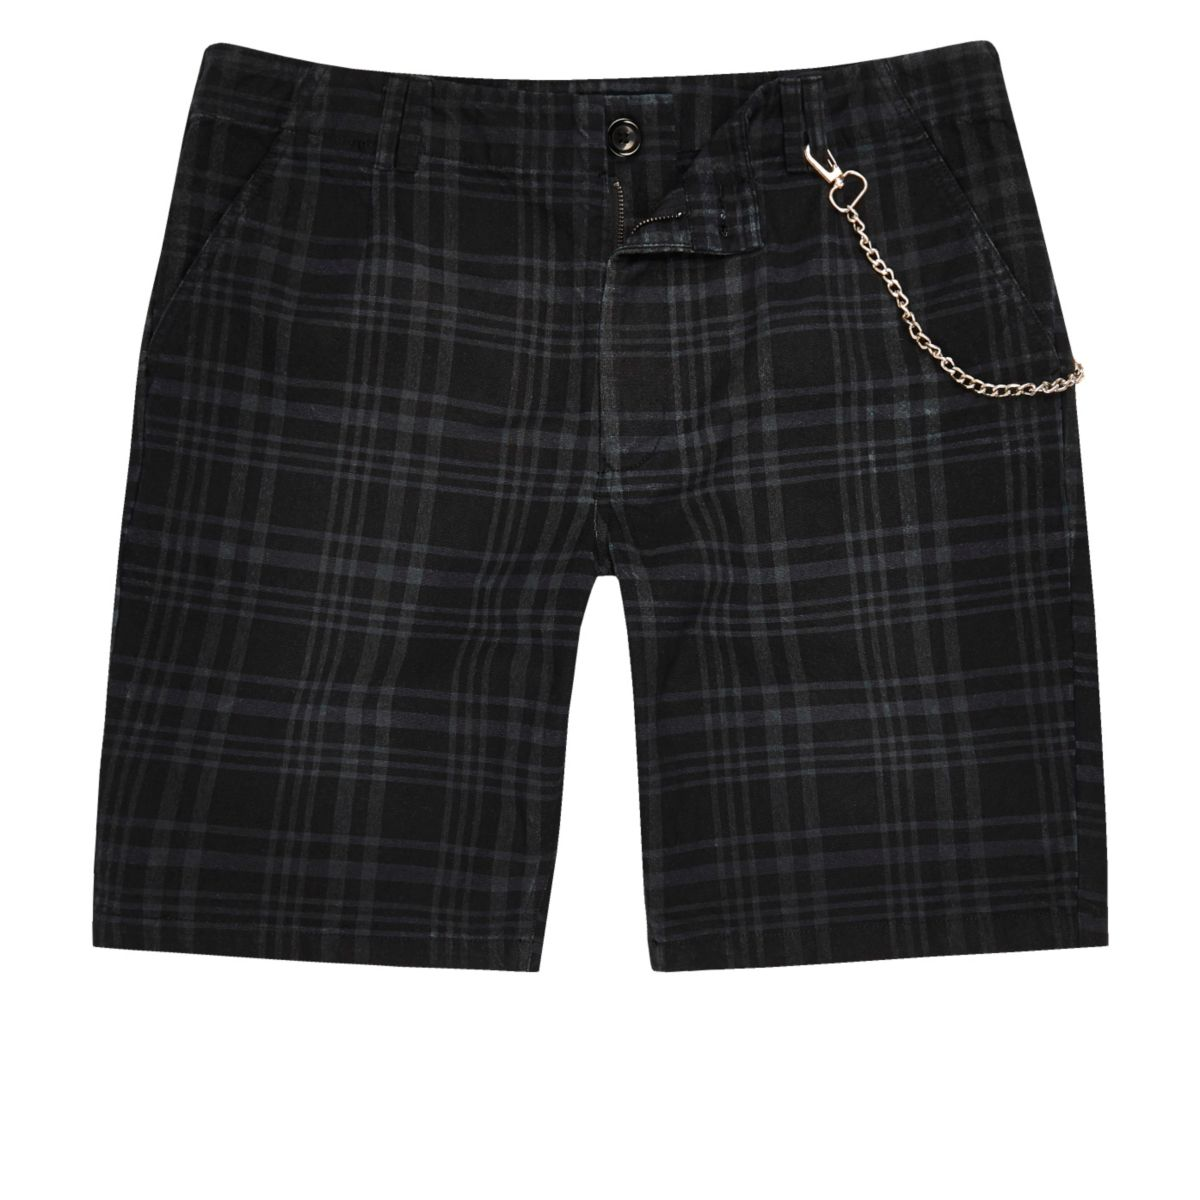 Navy blue check slim fit shorts